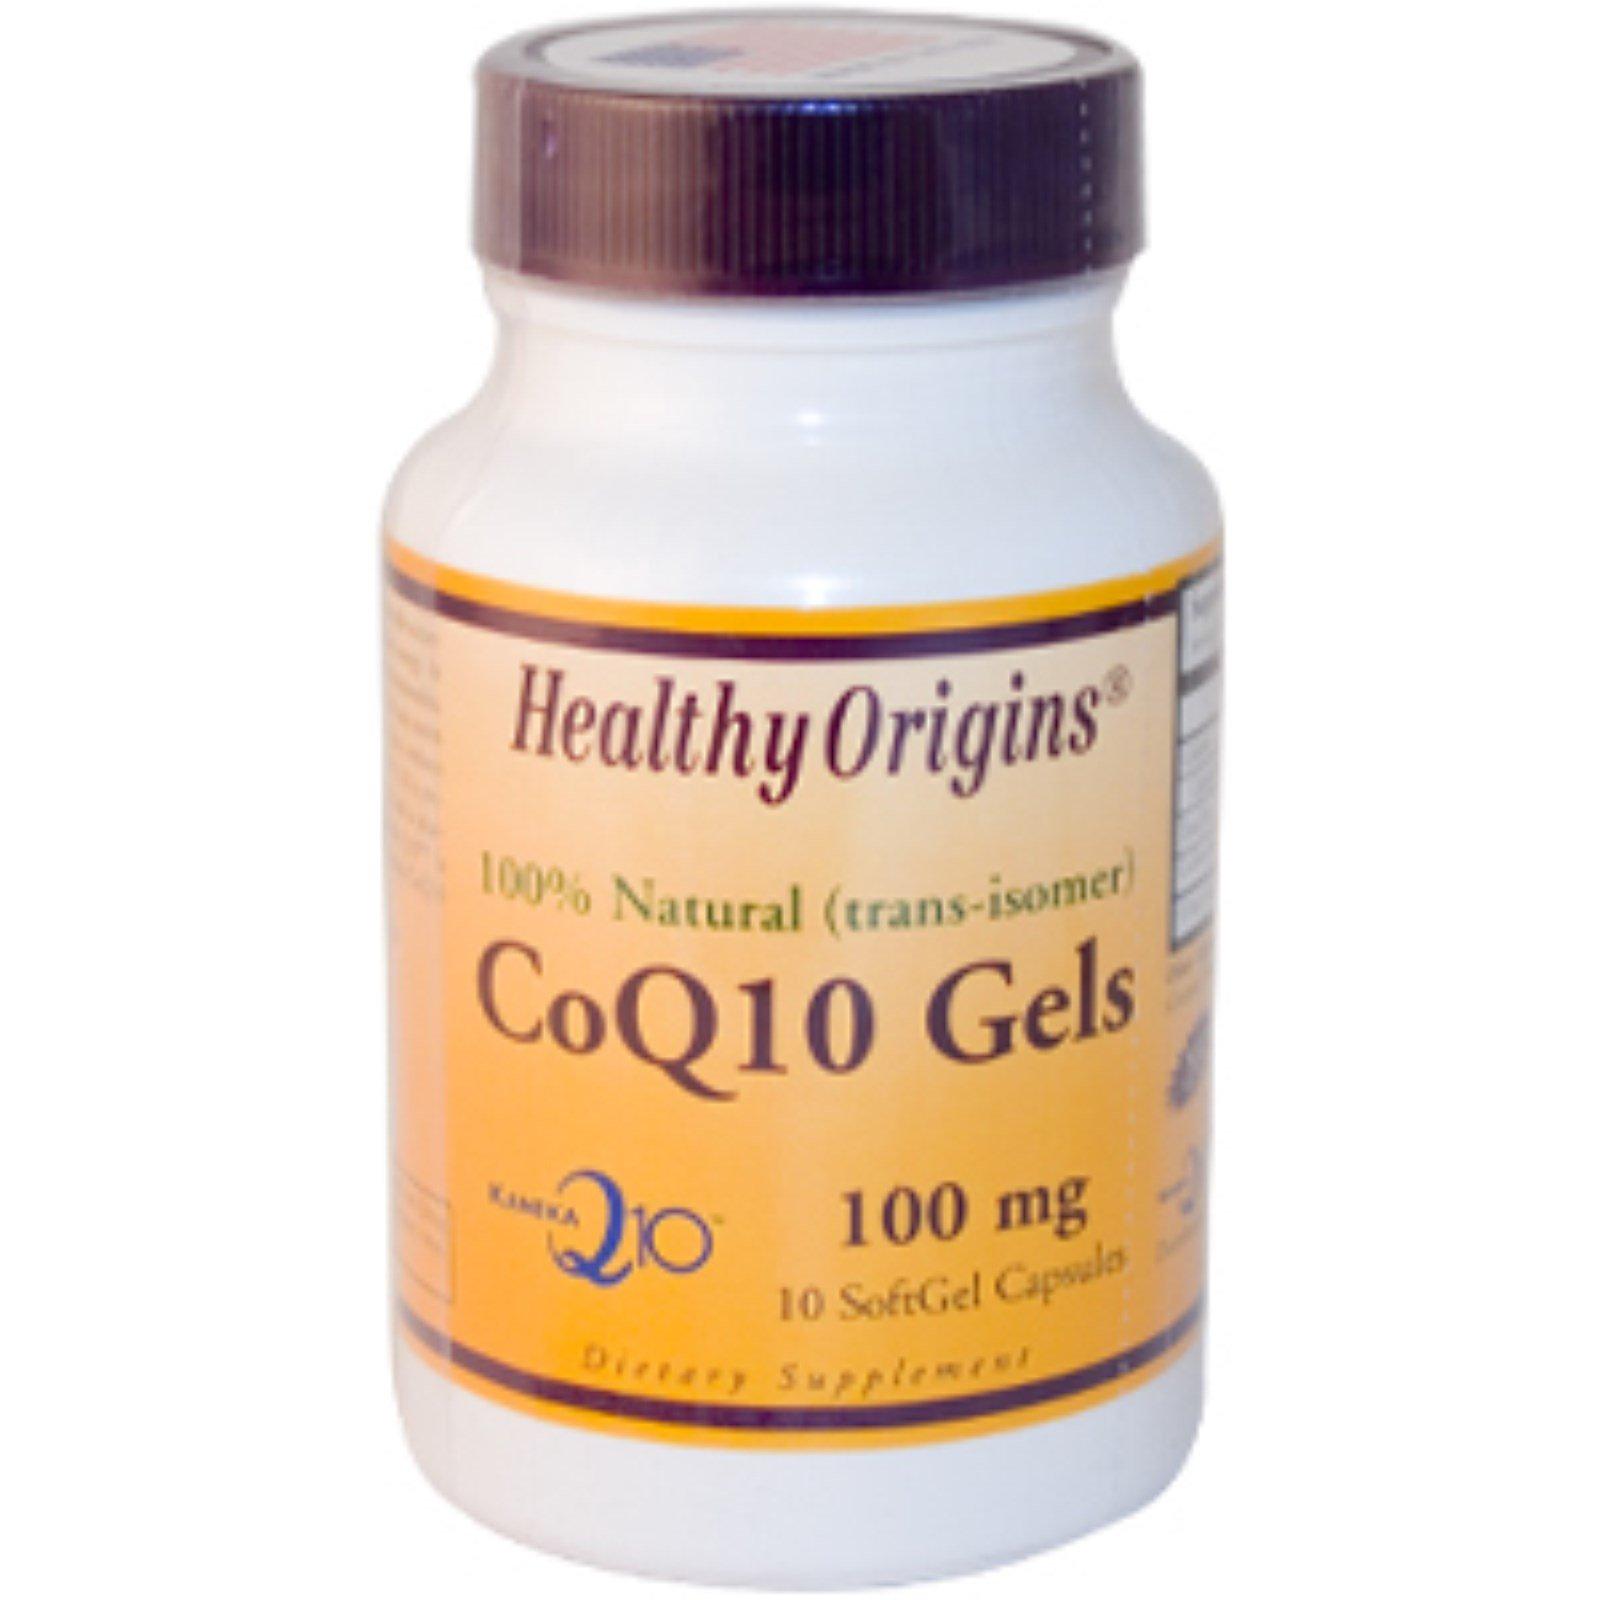 Healthy Origins, Гели CoQ10, 100 мг, 10 желатиновых капсул